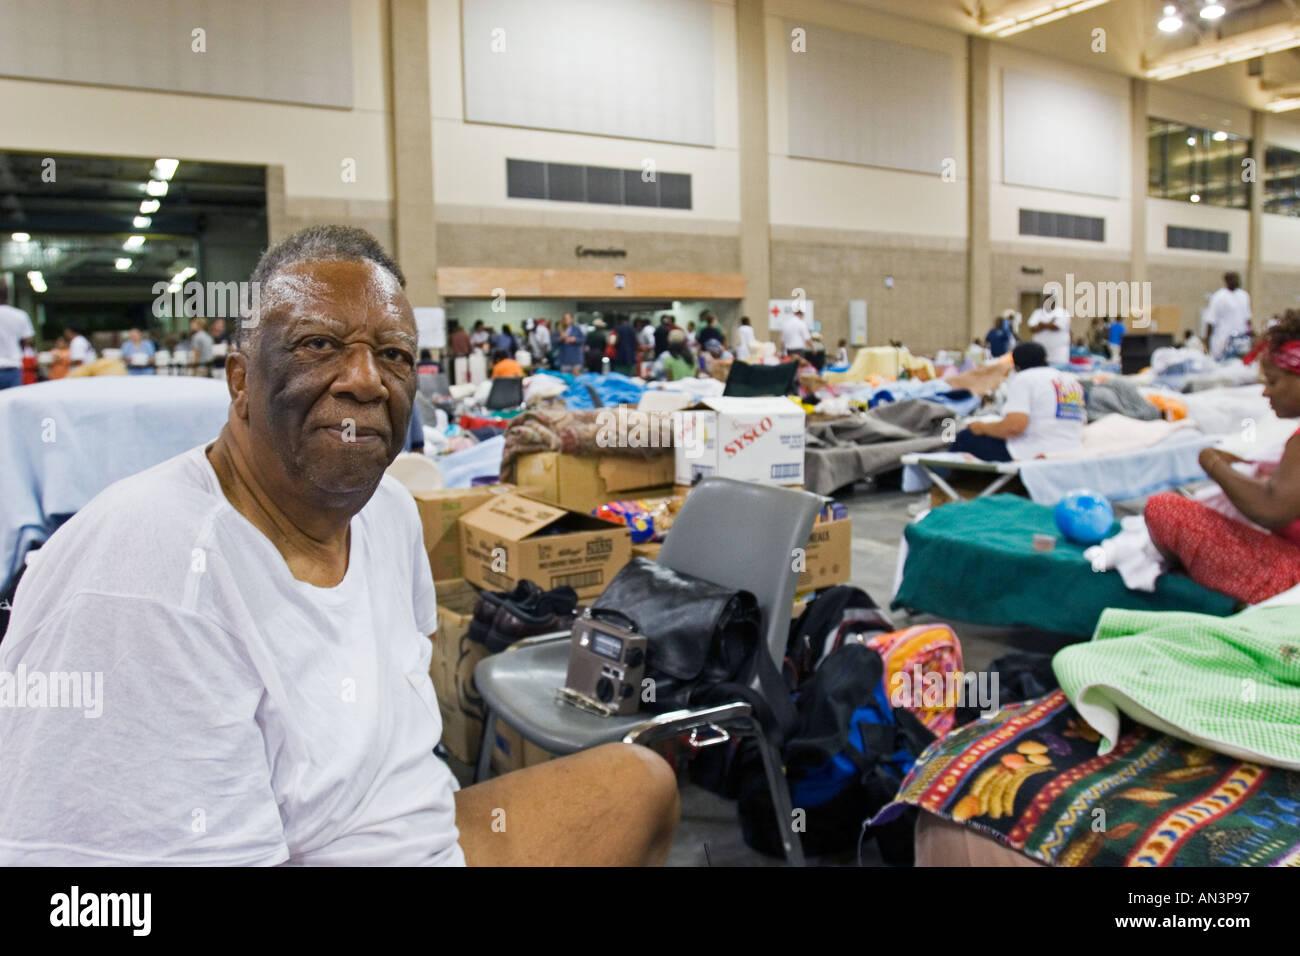 Hurricane Katrina Survivor in Baton Rouge Shelter - Stock Image